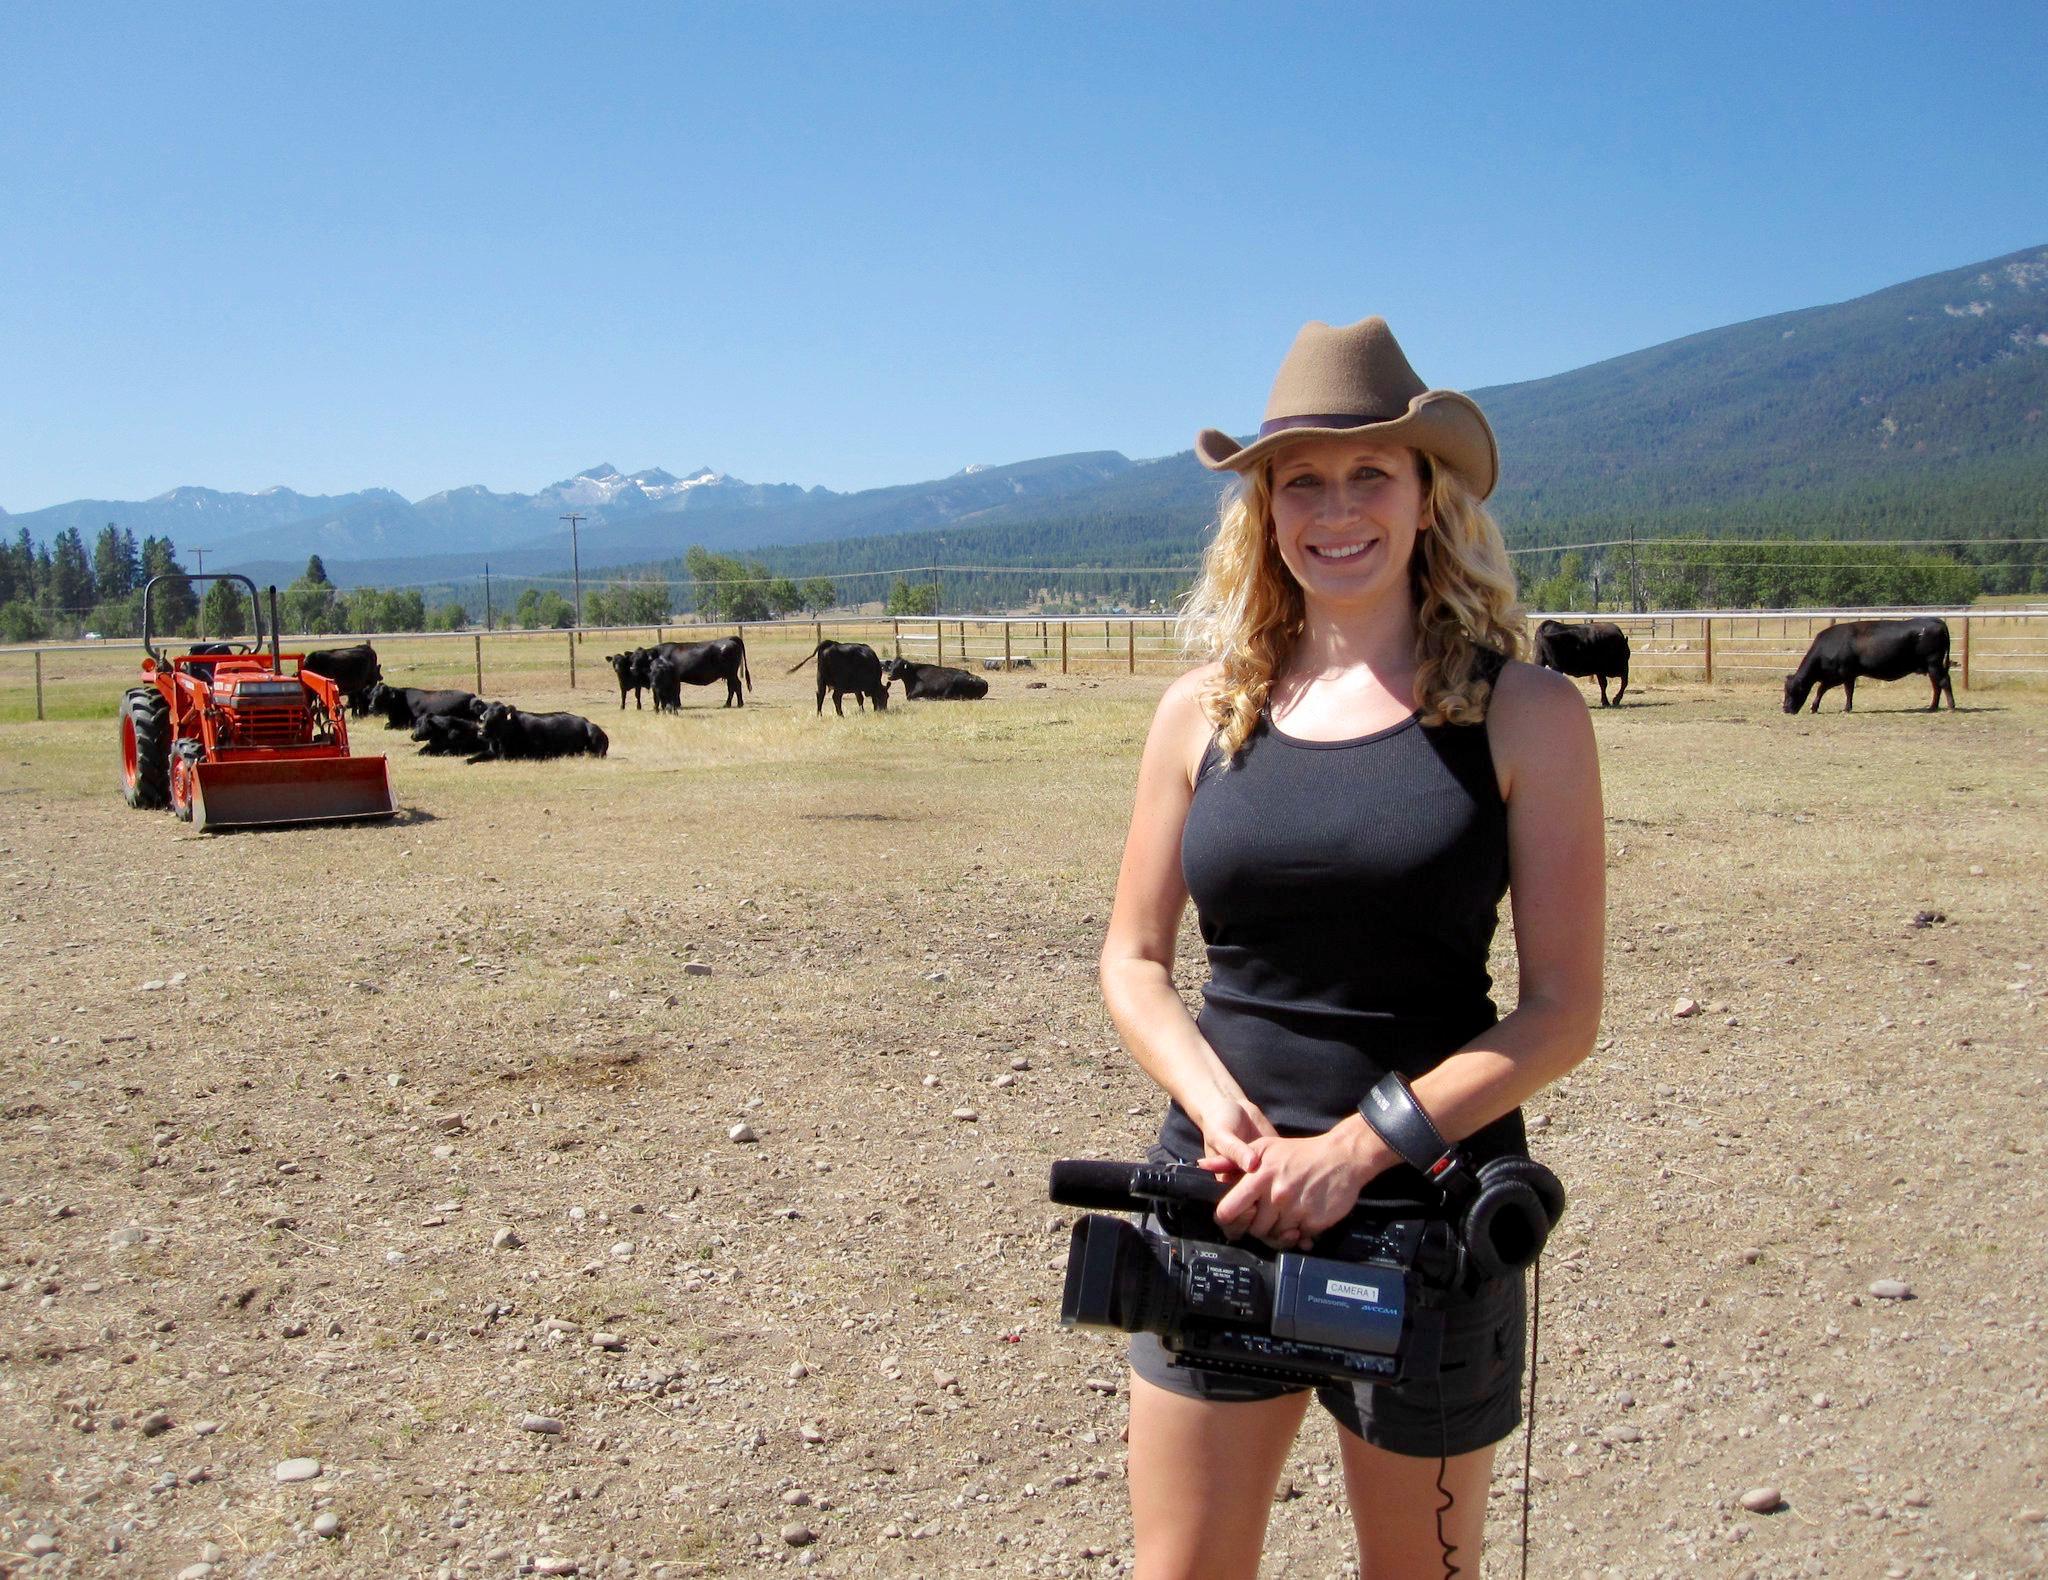 camera cowboy hat